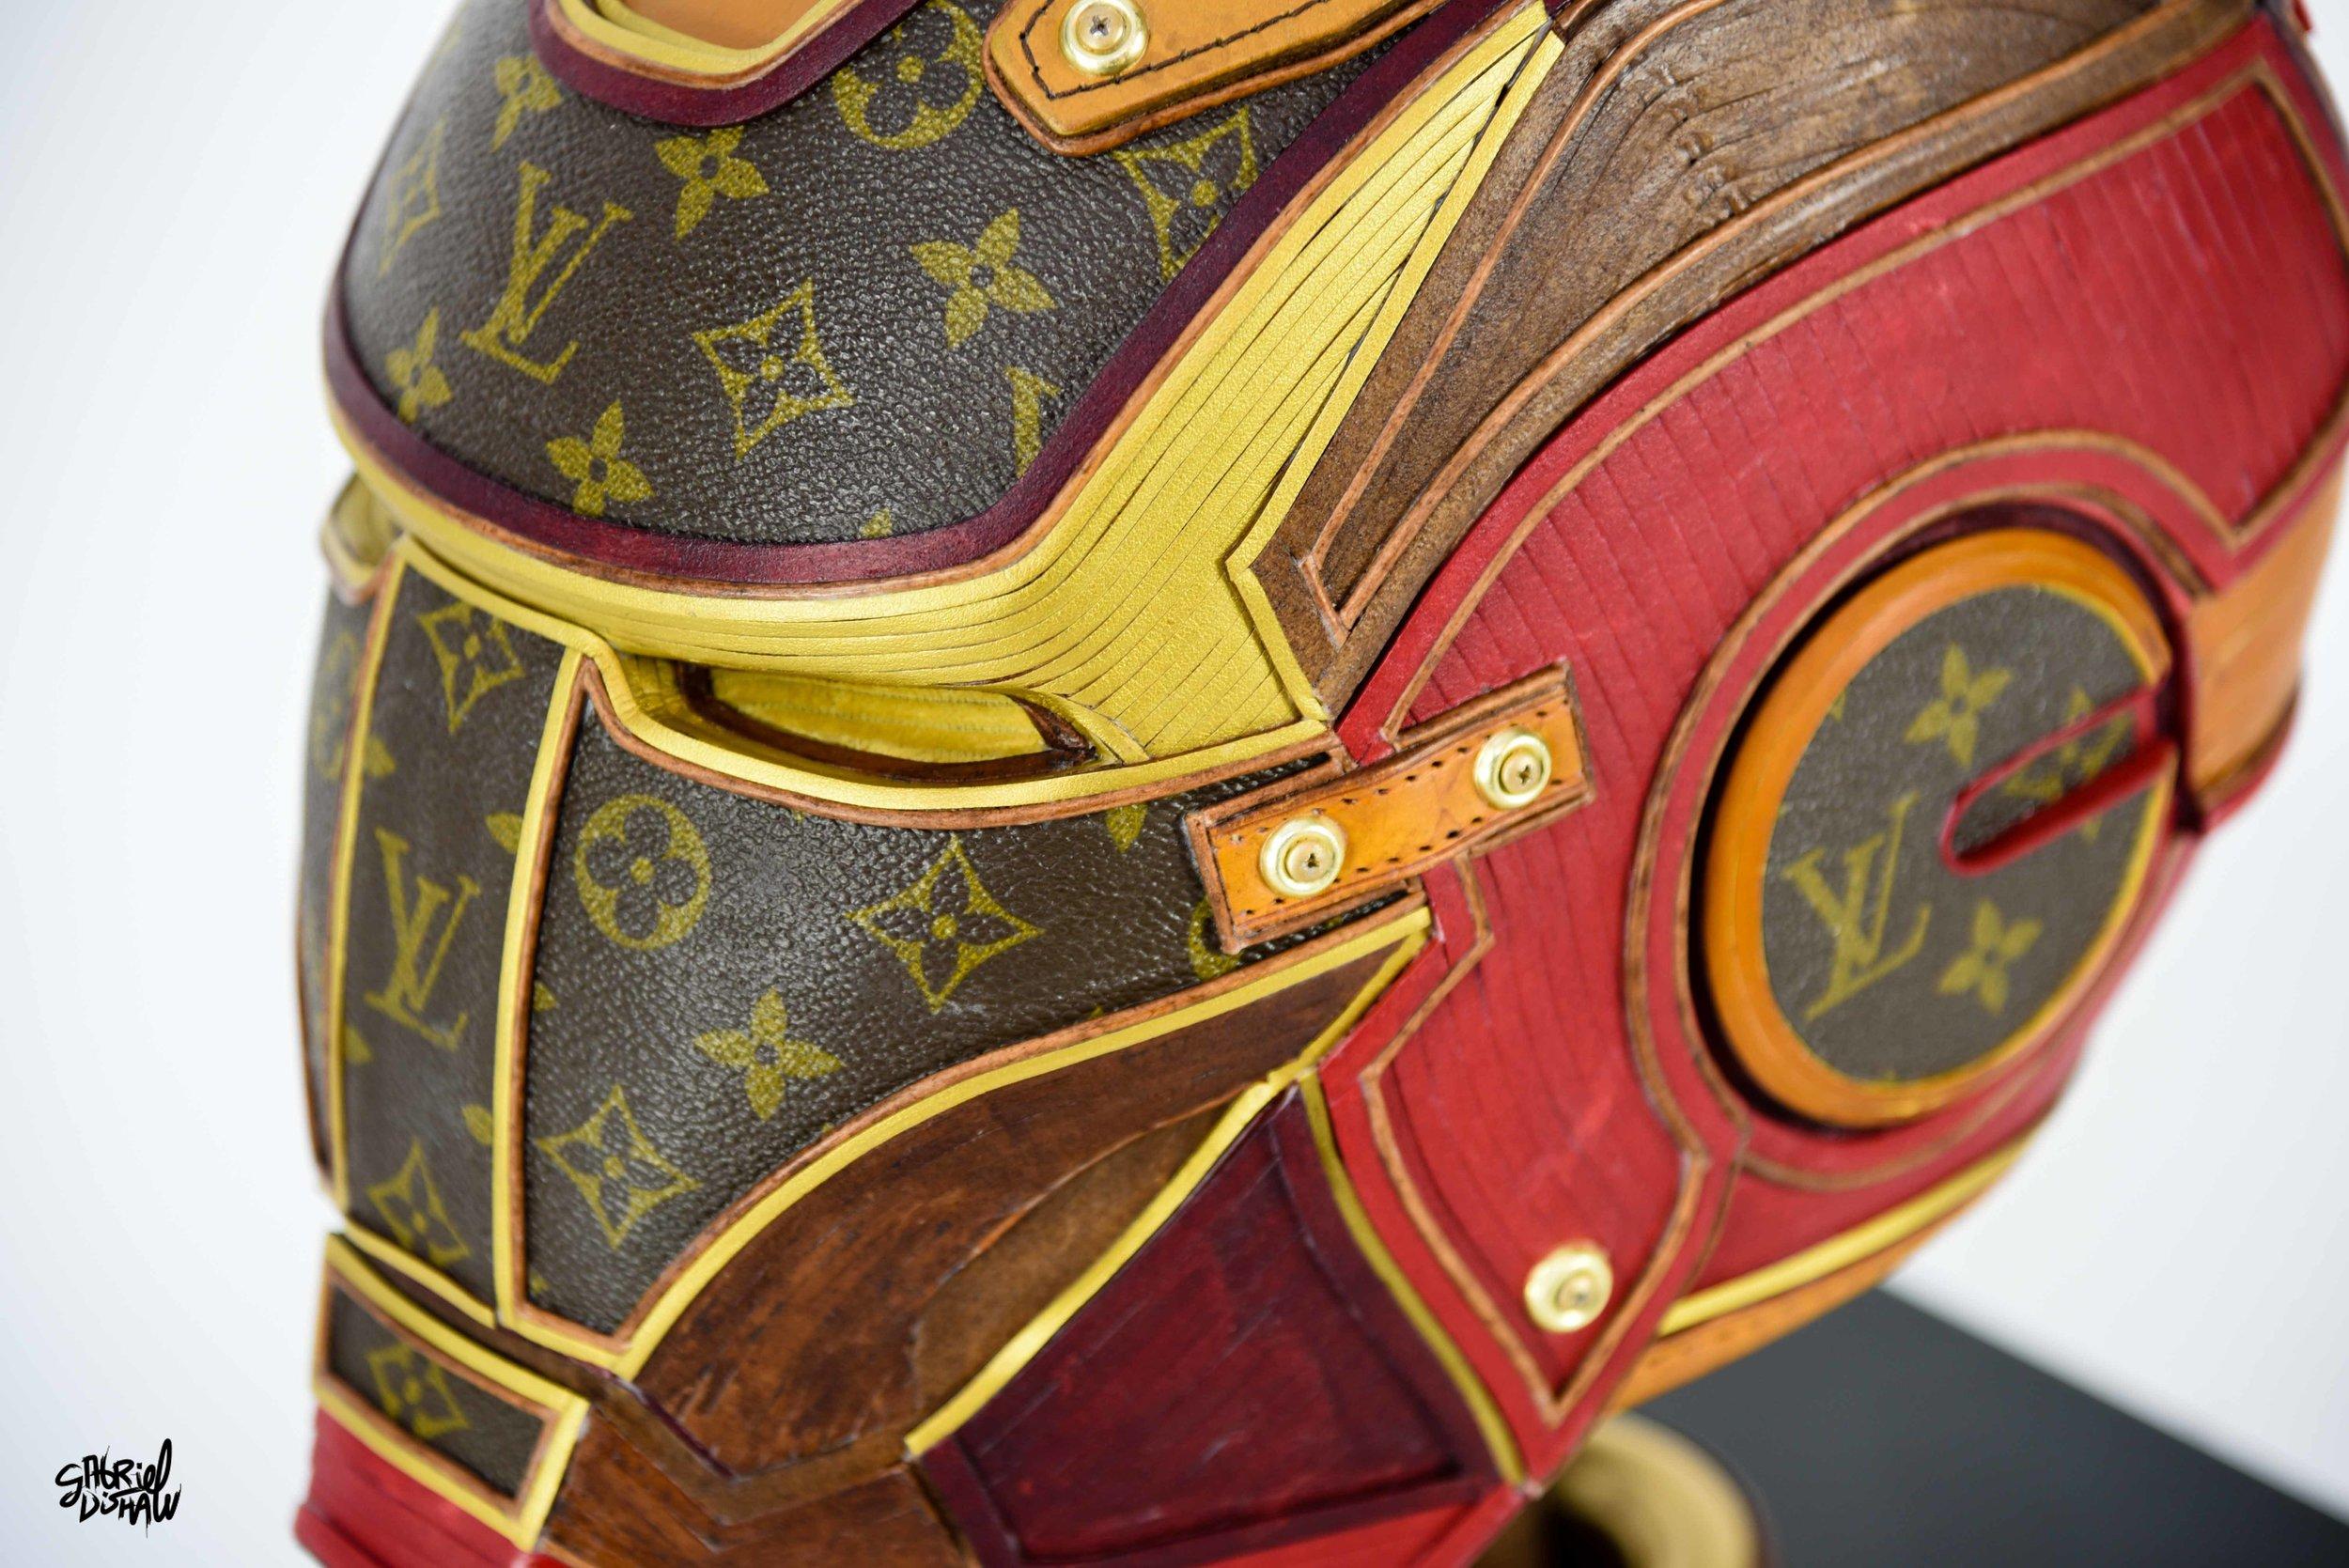 Gabriel Dishaw Iron Man LV-4249.jpg